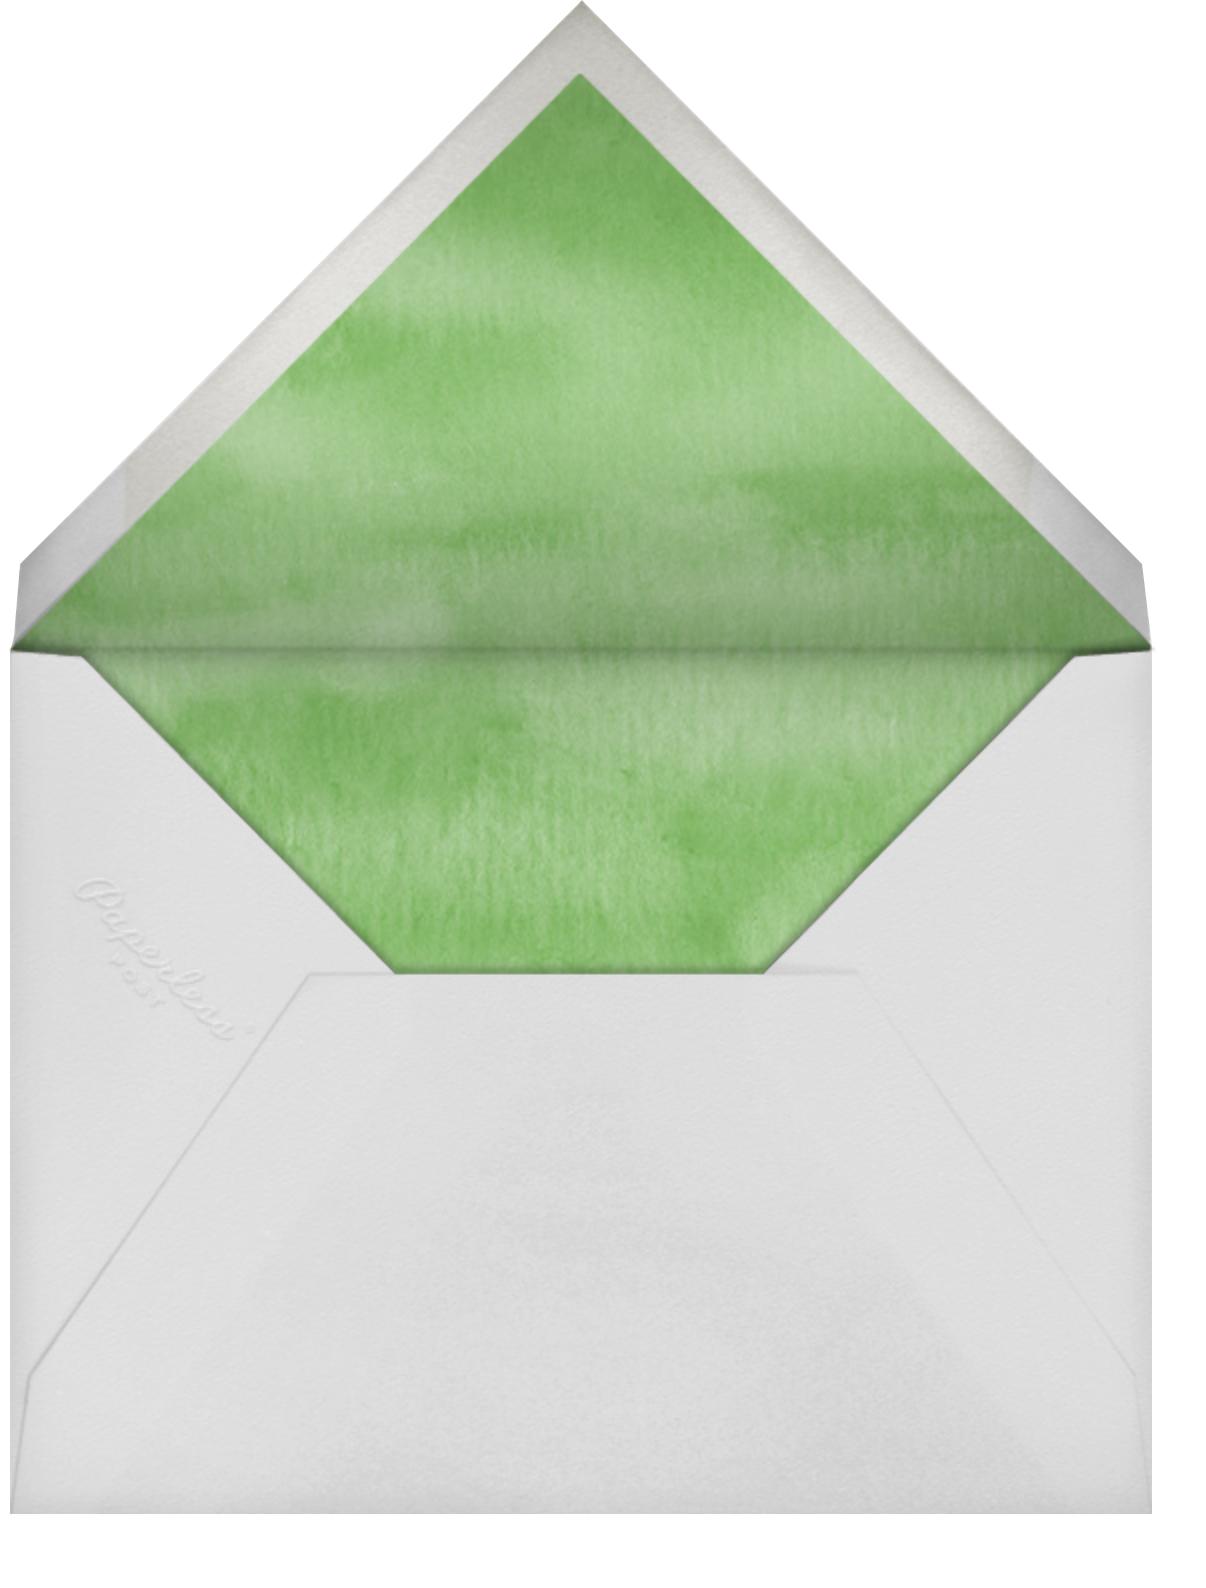 Naiad - Felix Doolittle - Reception - envelope back